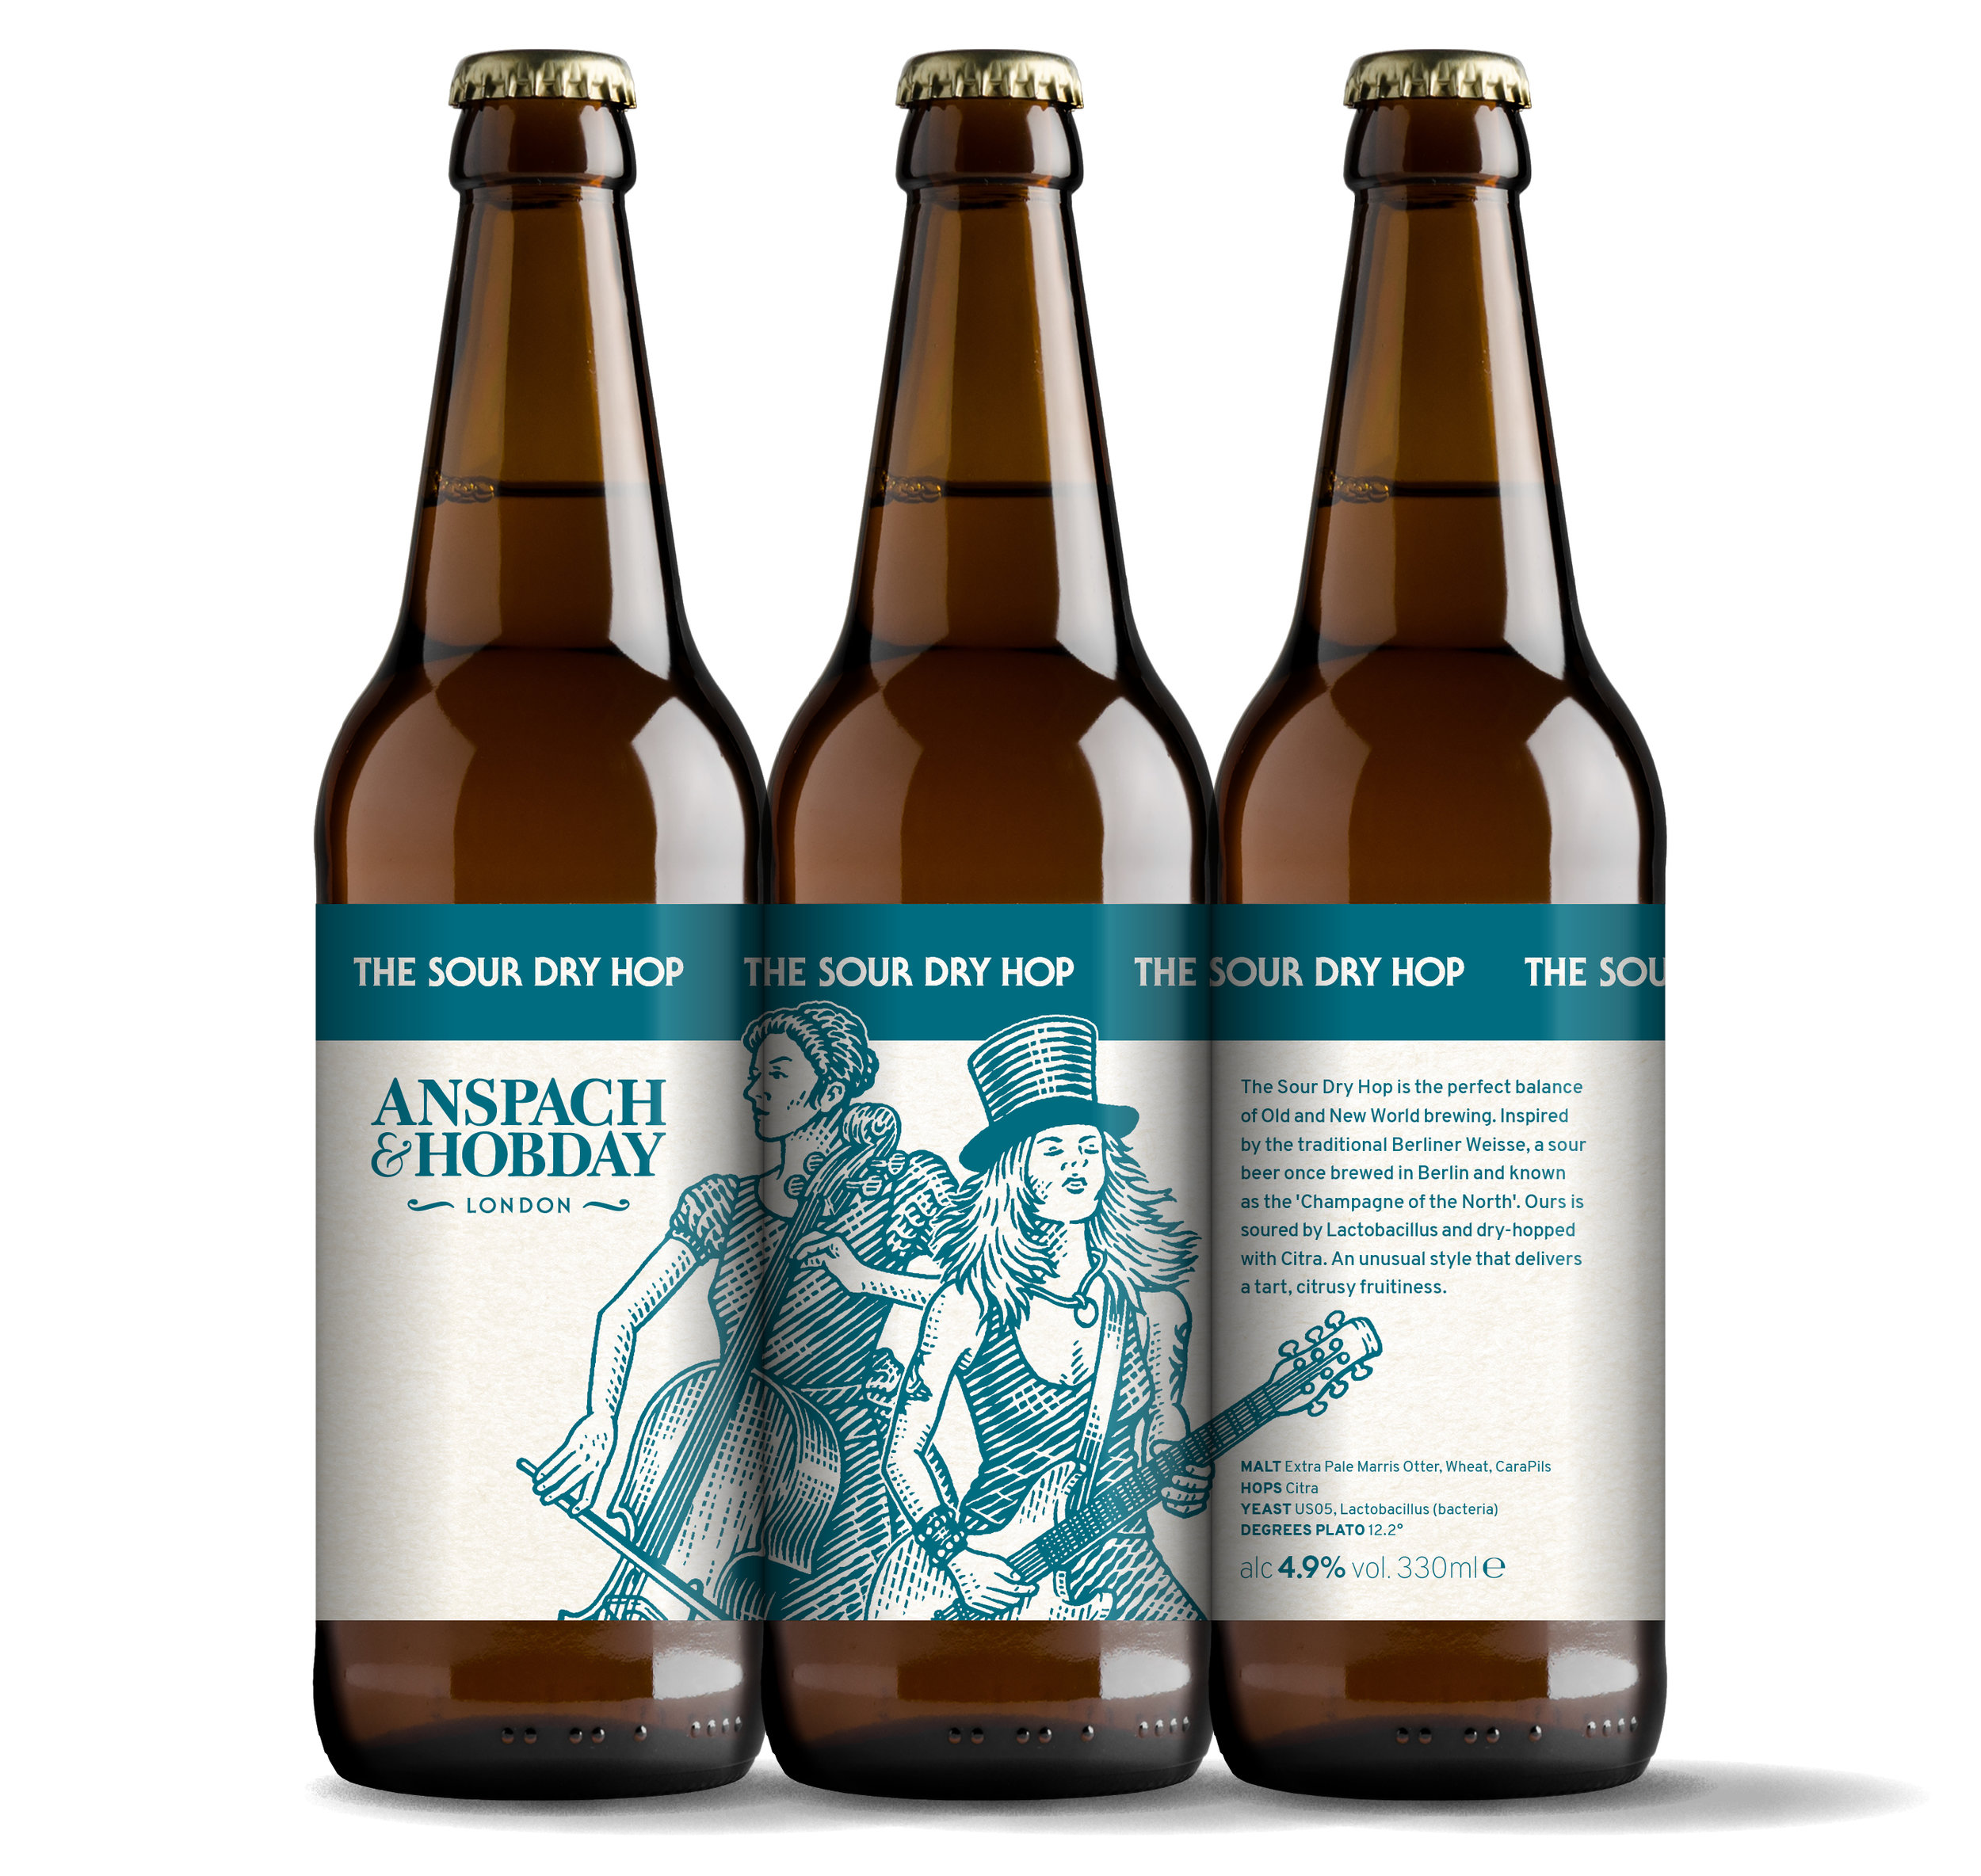 A&H_Bottle_330ml_VISUAL_SOUR_DRY_HOP.jpg